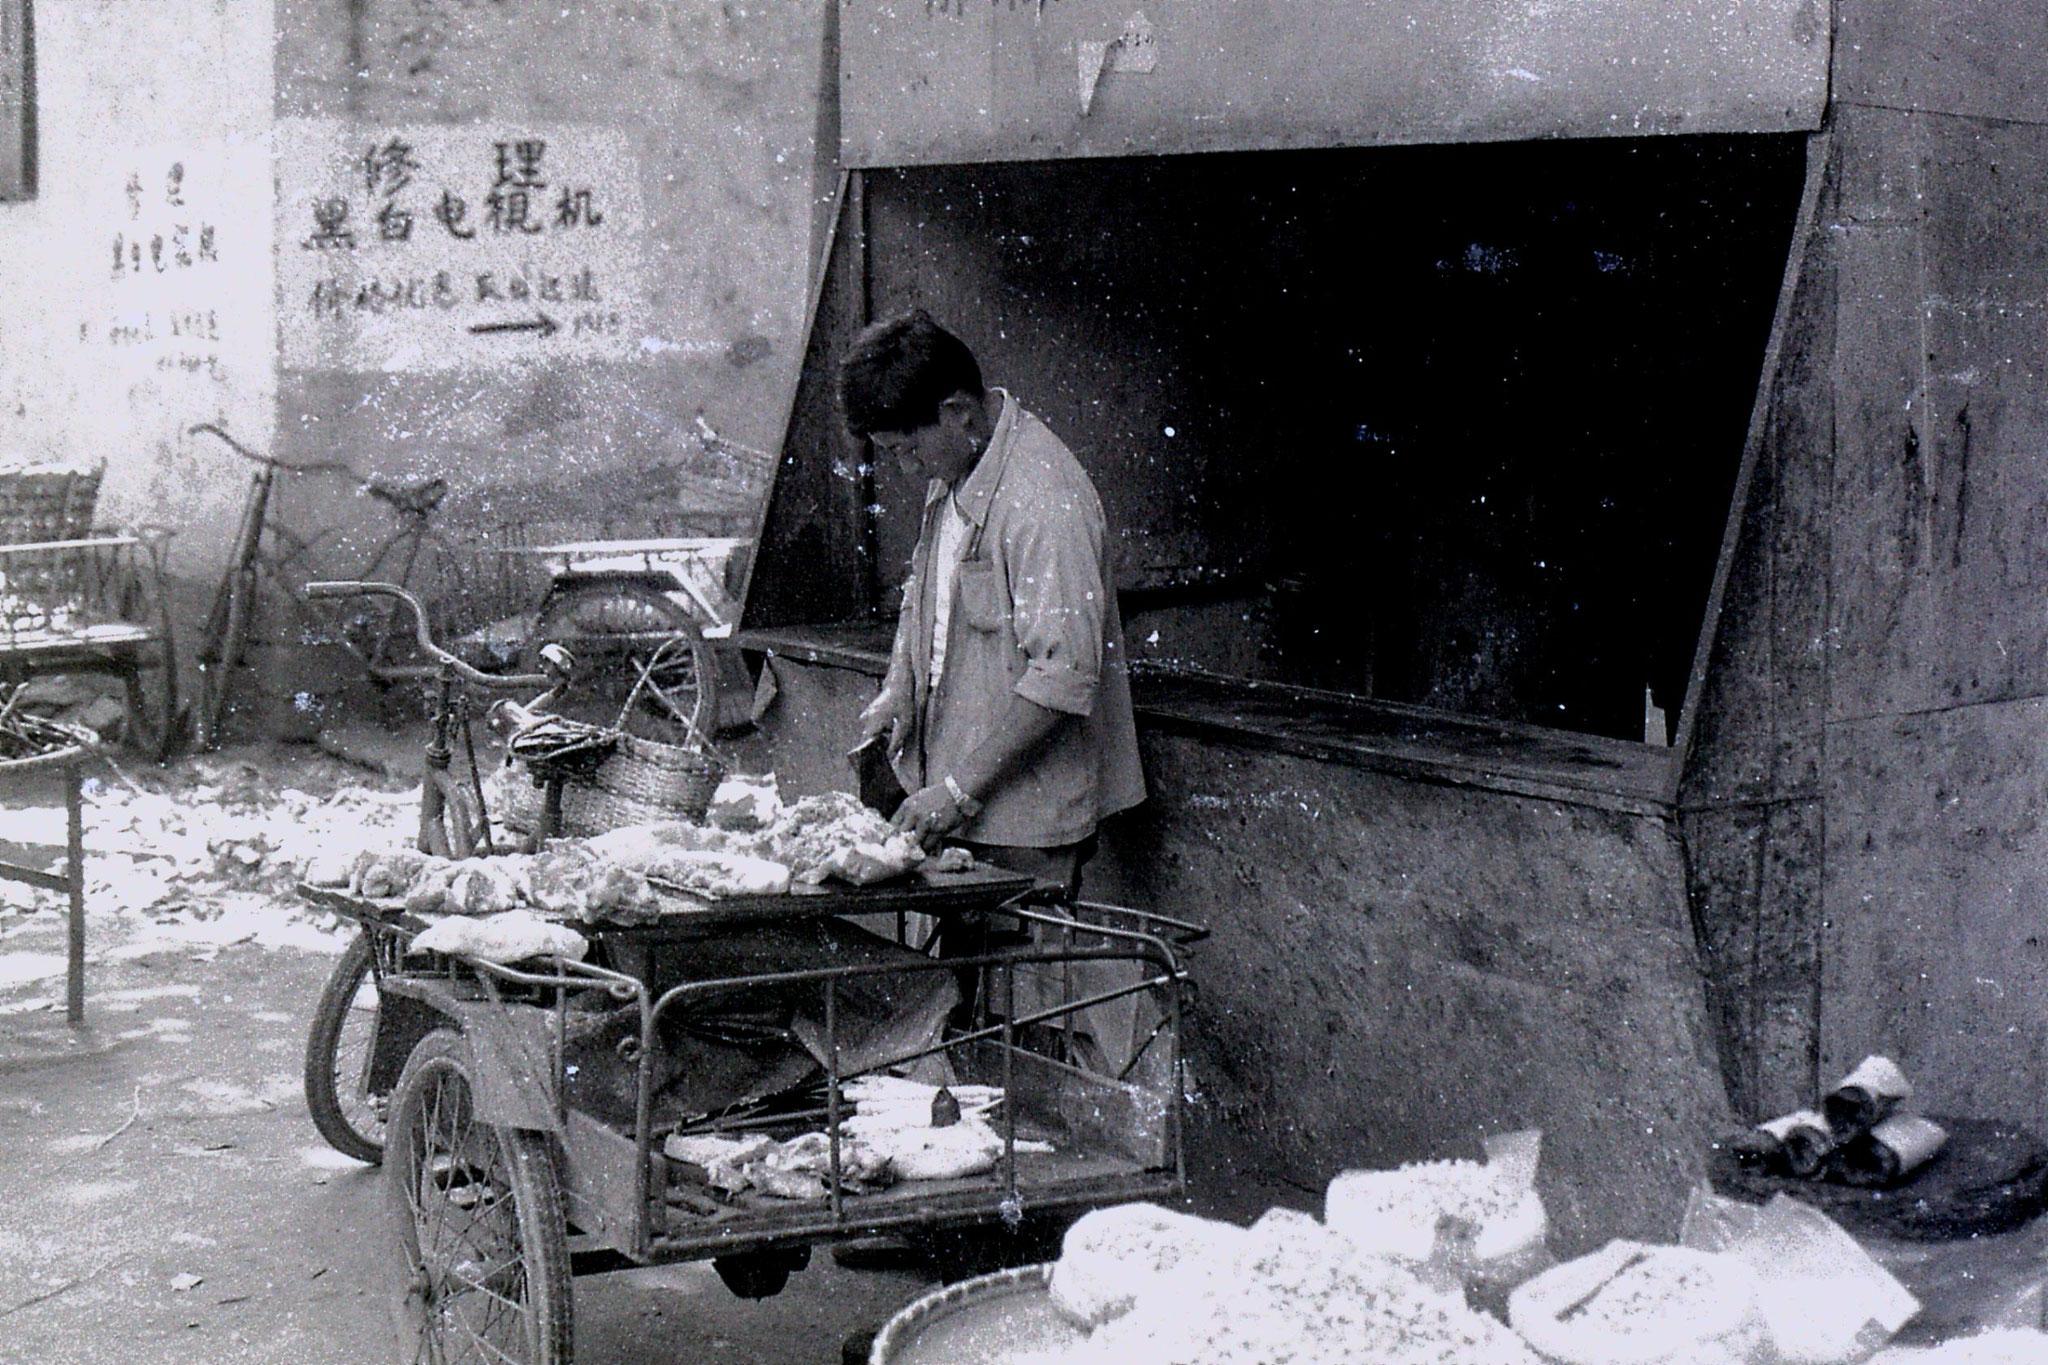 27/6/1989: 29: Shaoxing market, butcher